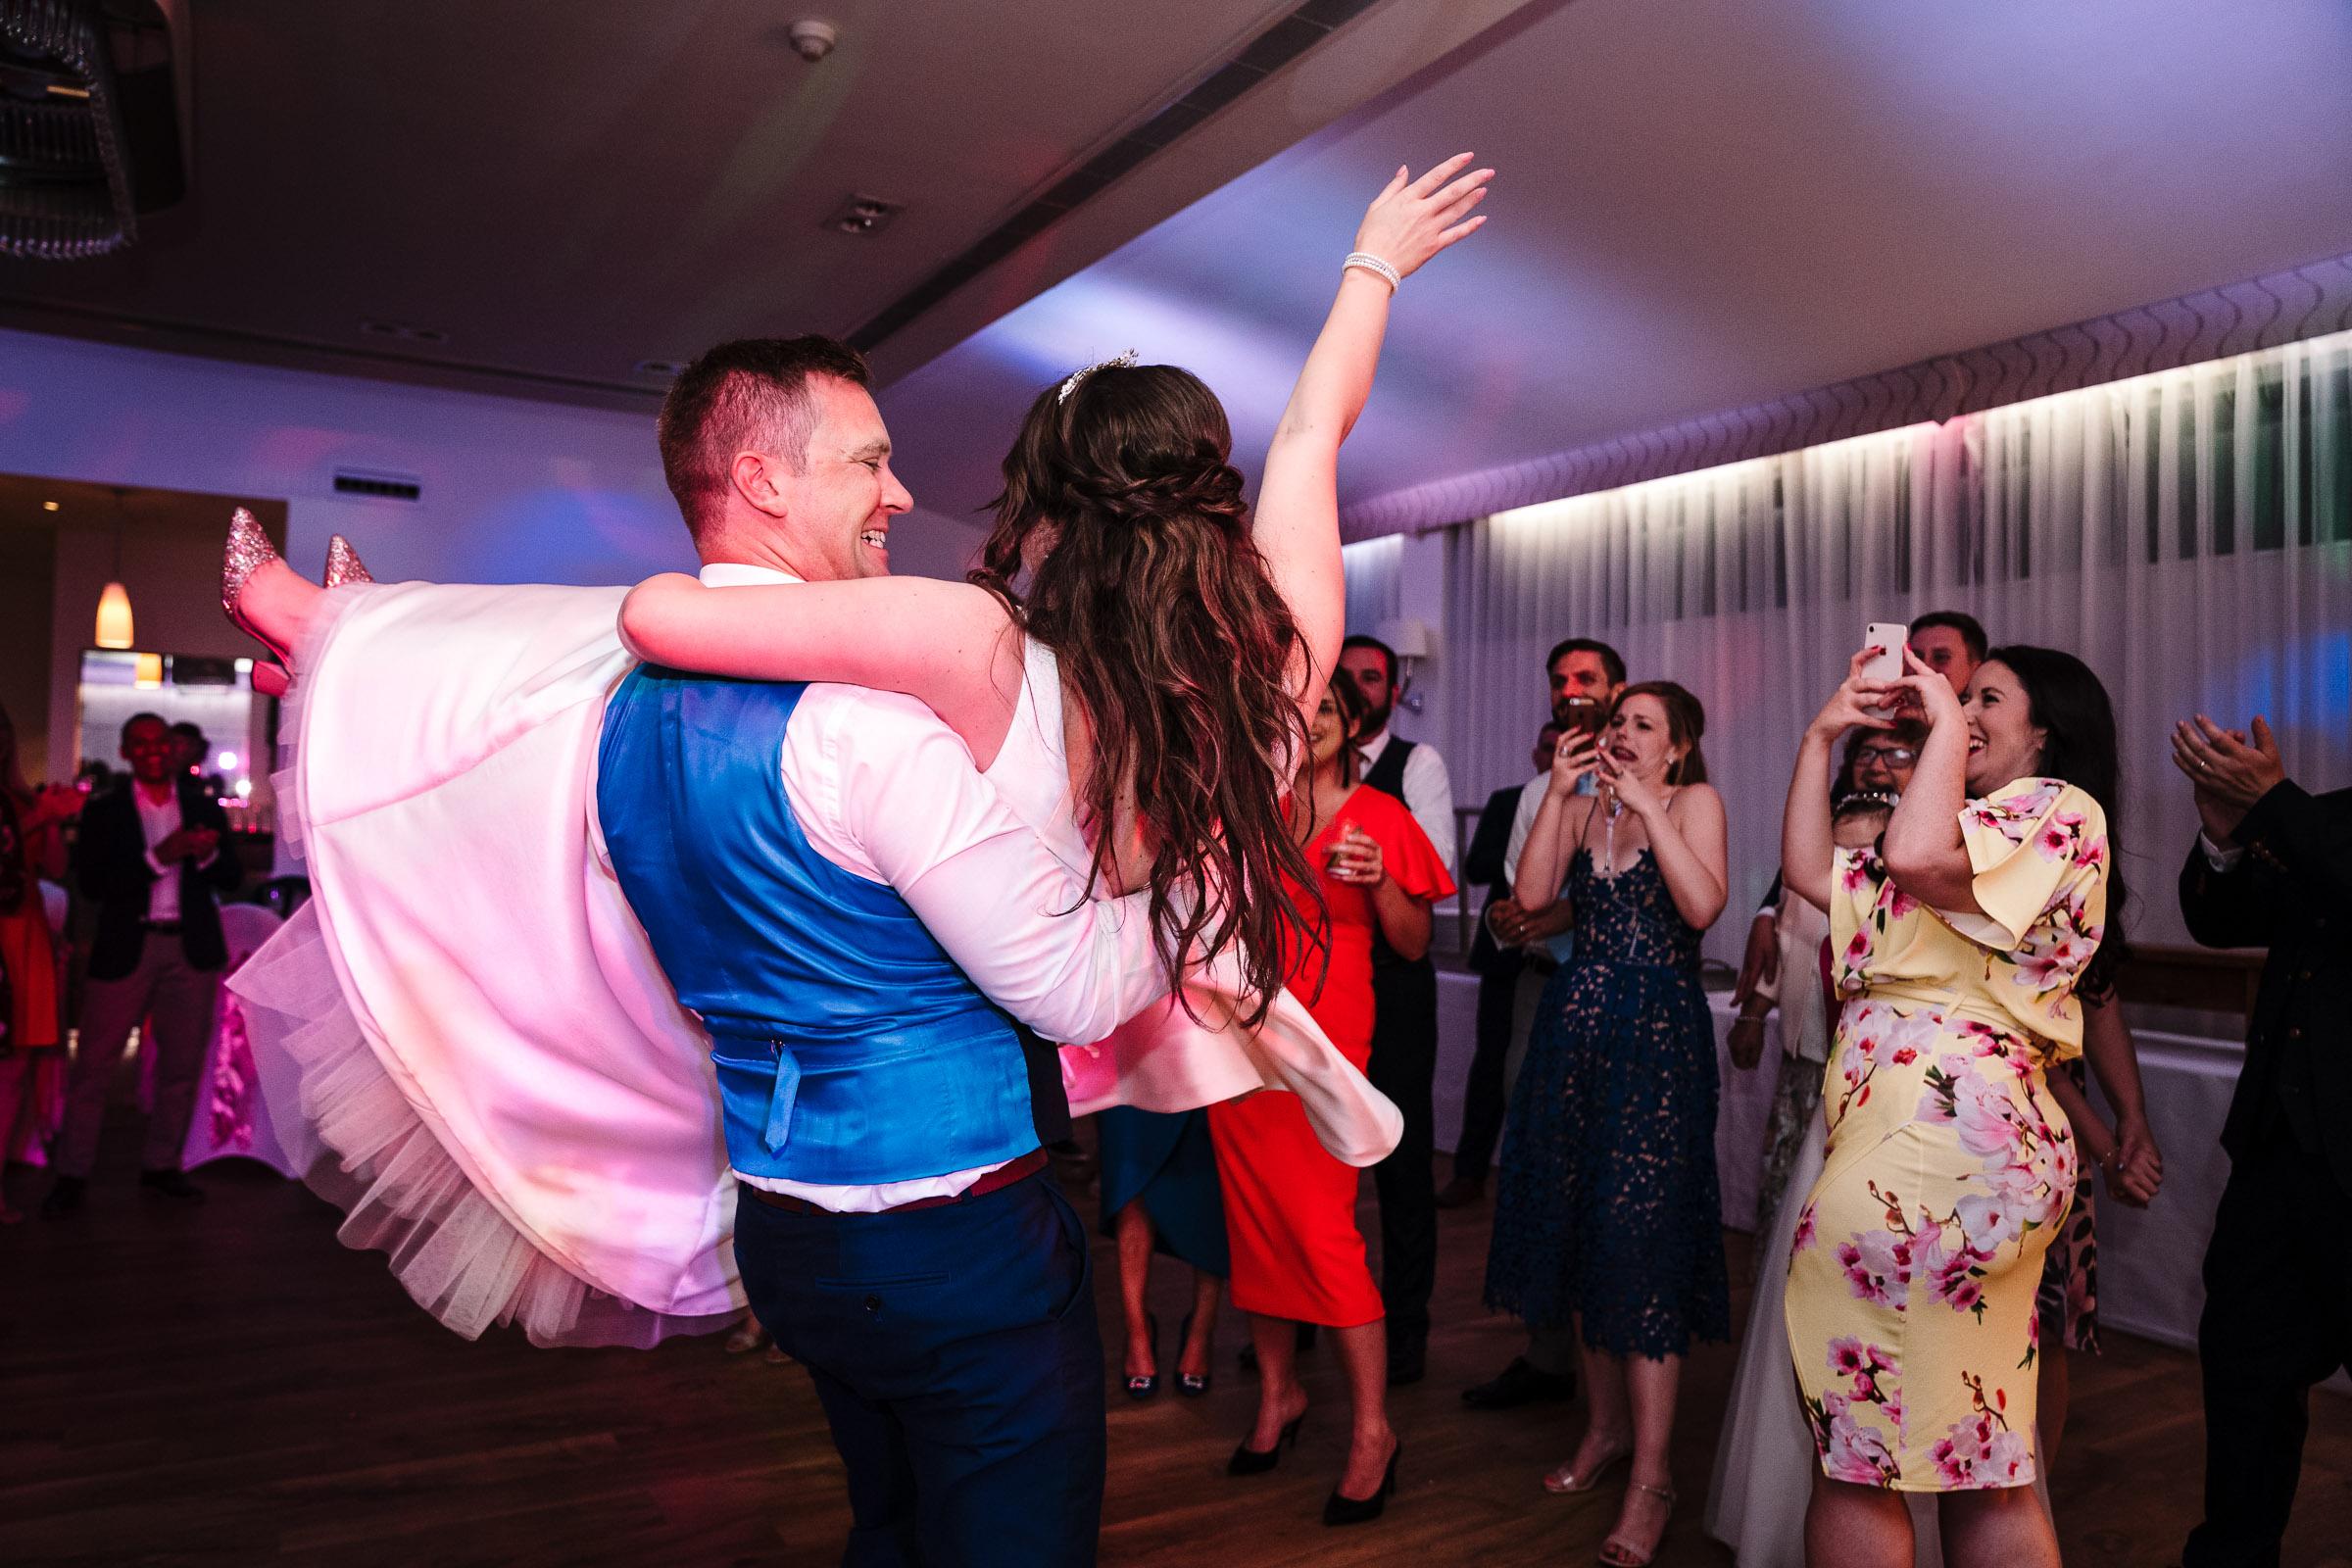 groom spinning bride around on dancefloor